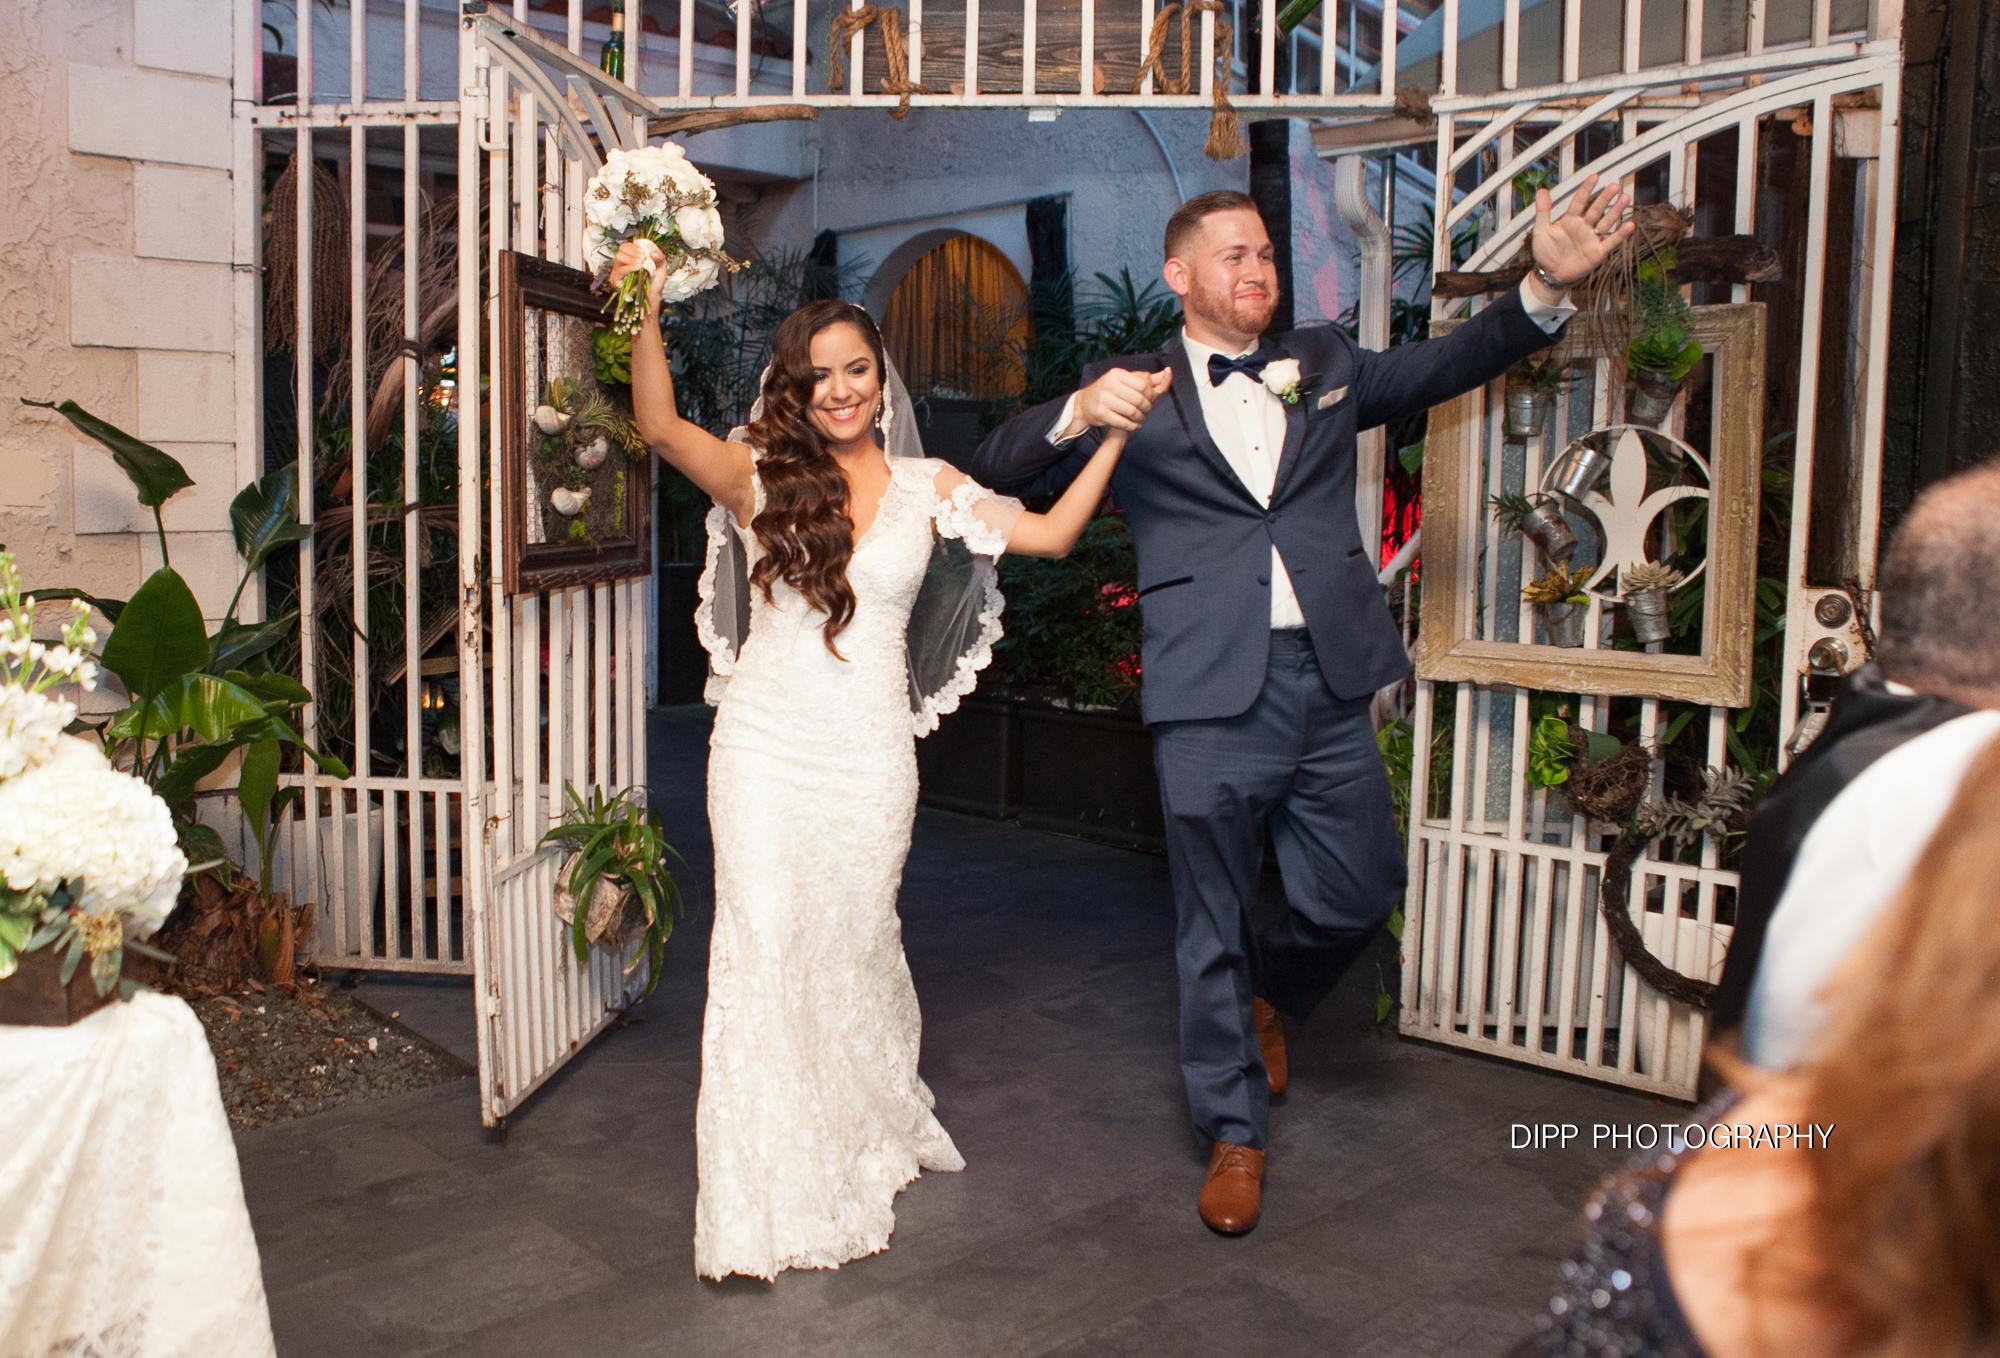 Dipp_2016 EDITED Melissa & Avilio Wedding-400